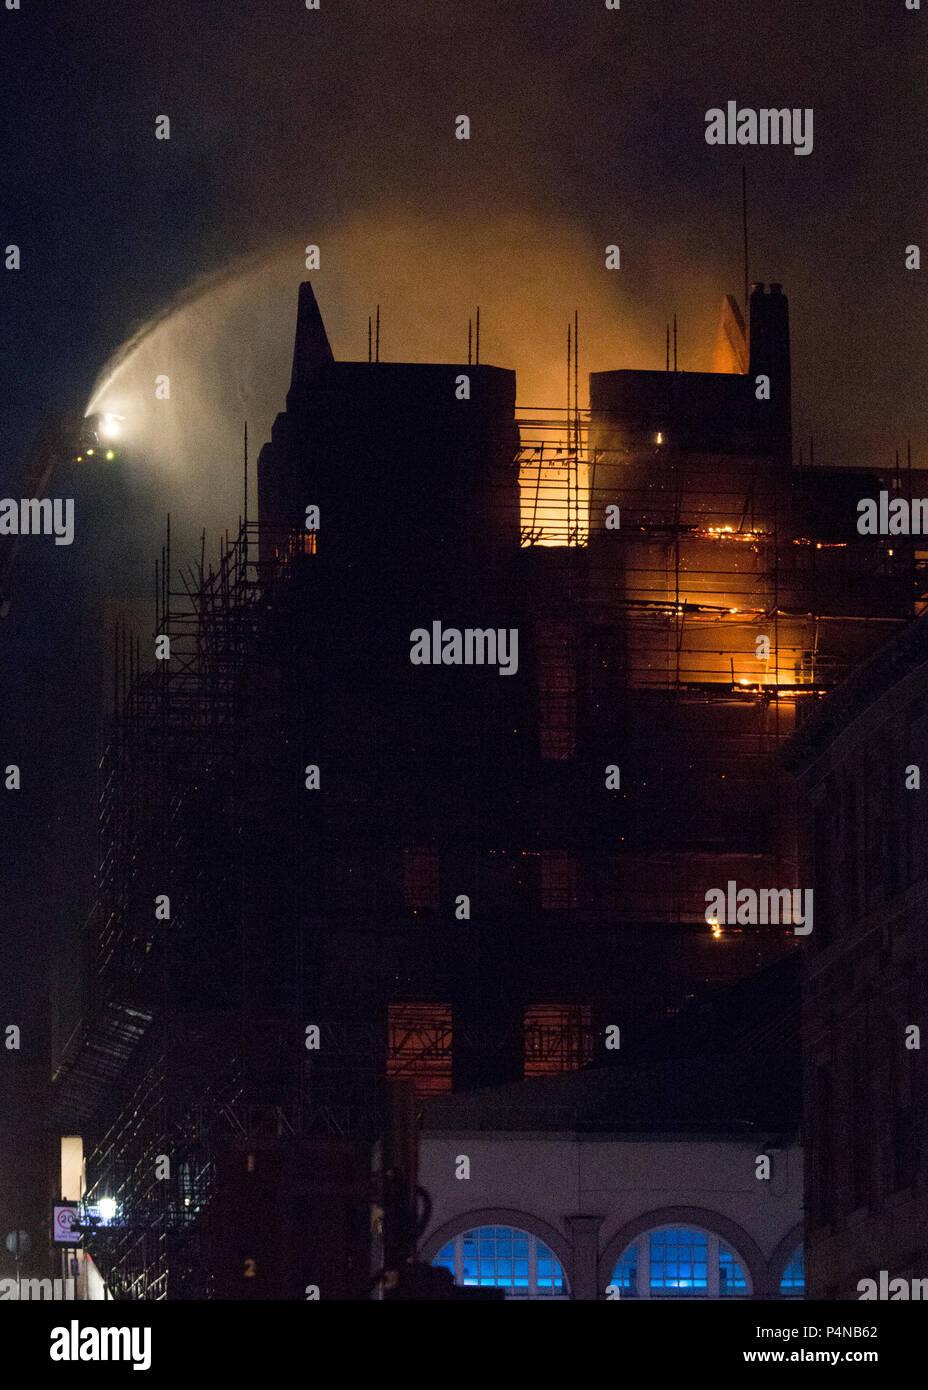 Charles Rennie Mackintosh Glasgow School of Art School fire 2018 - Stock Image